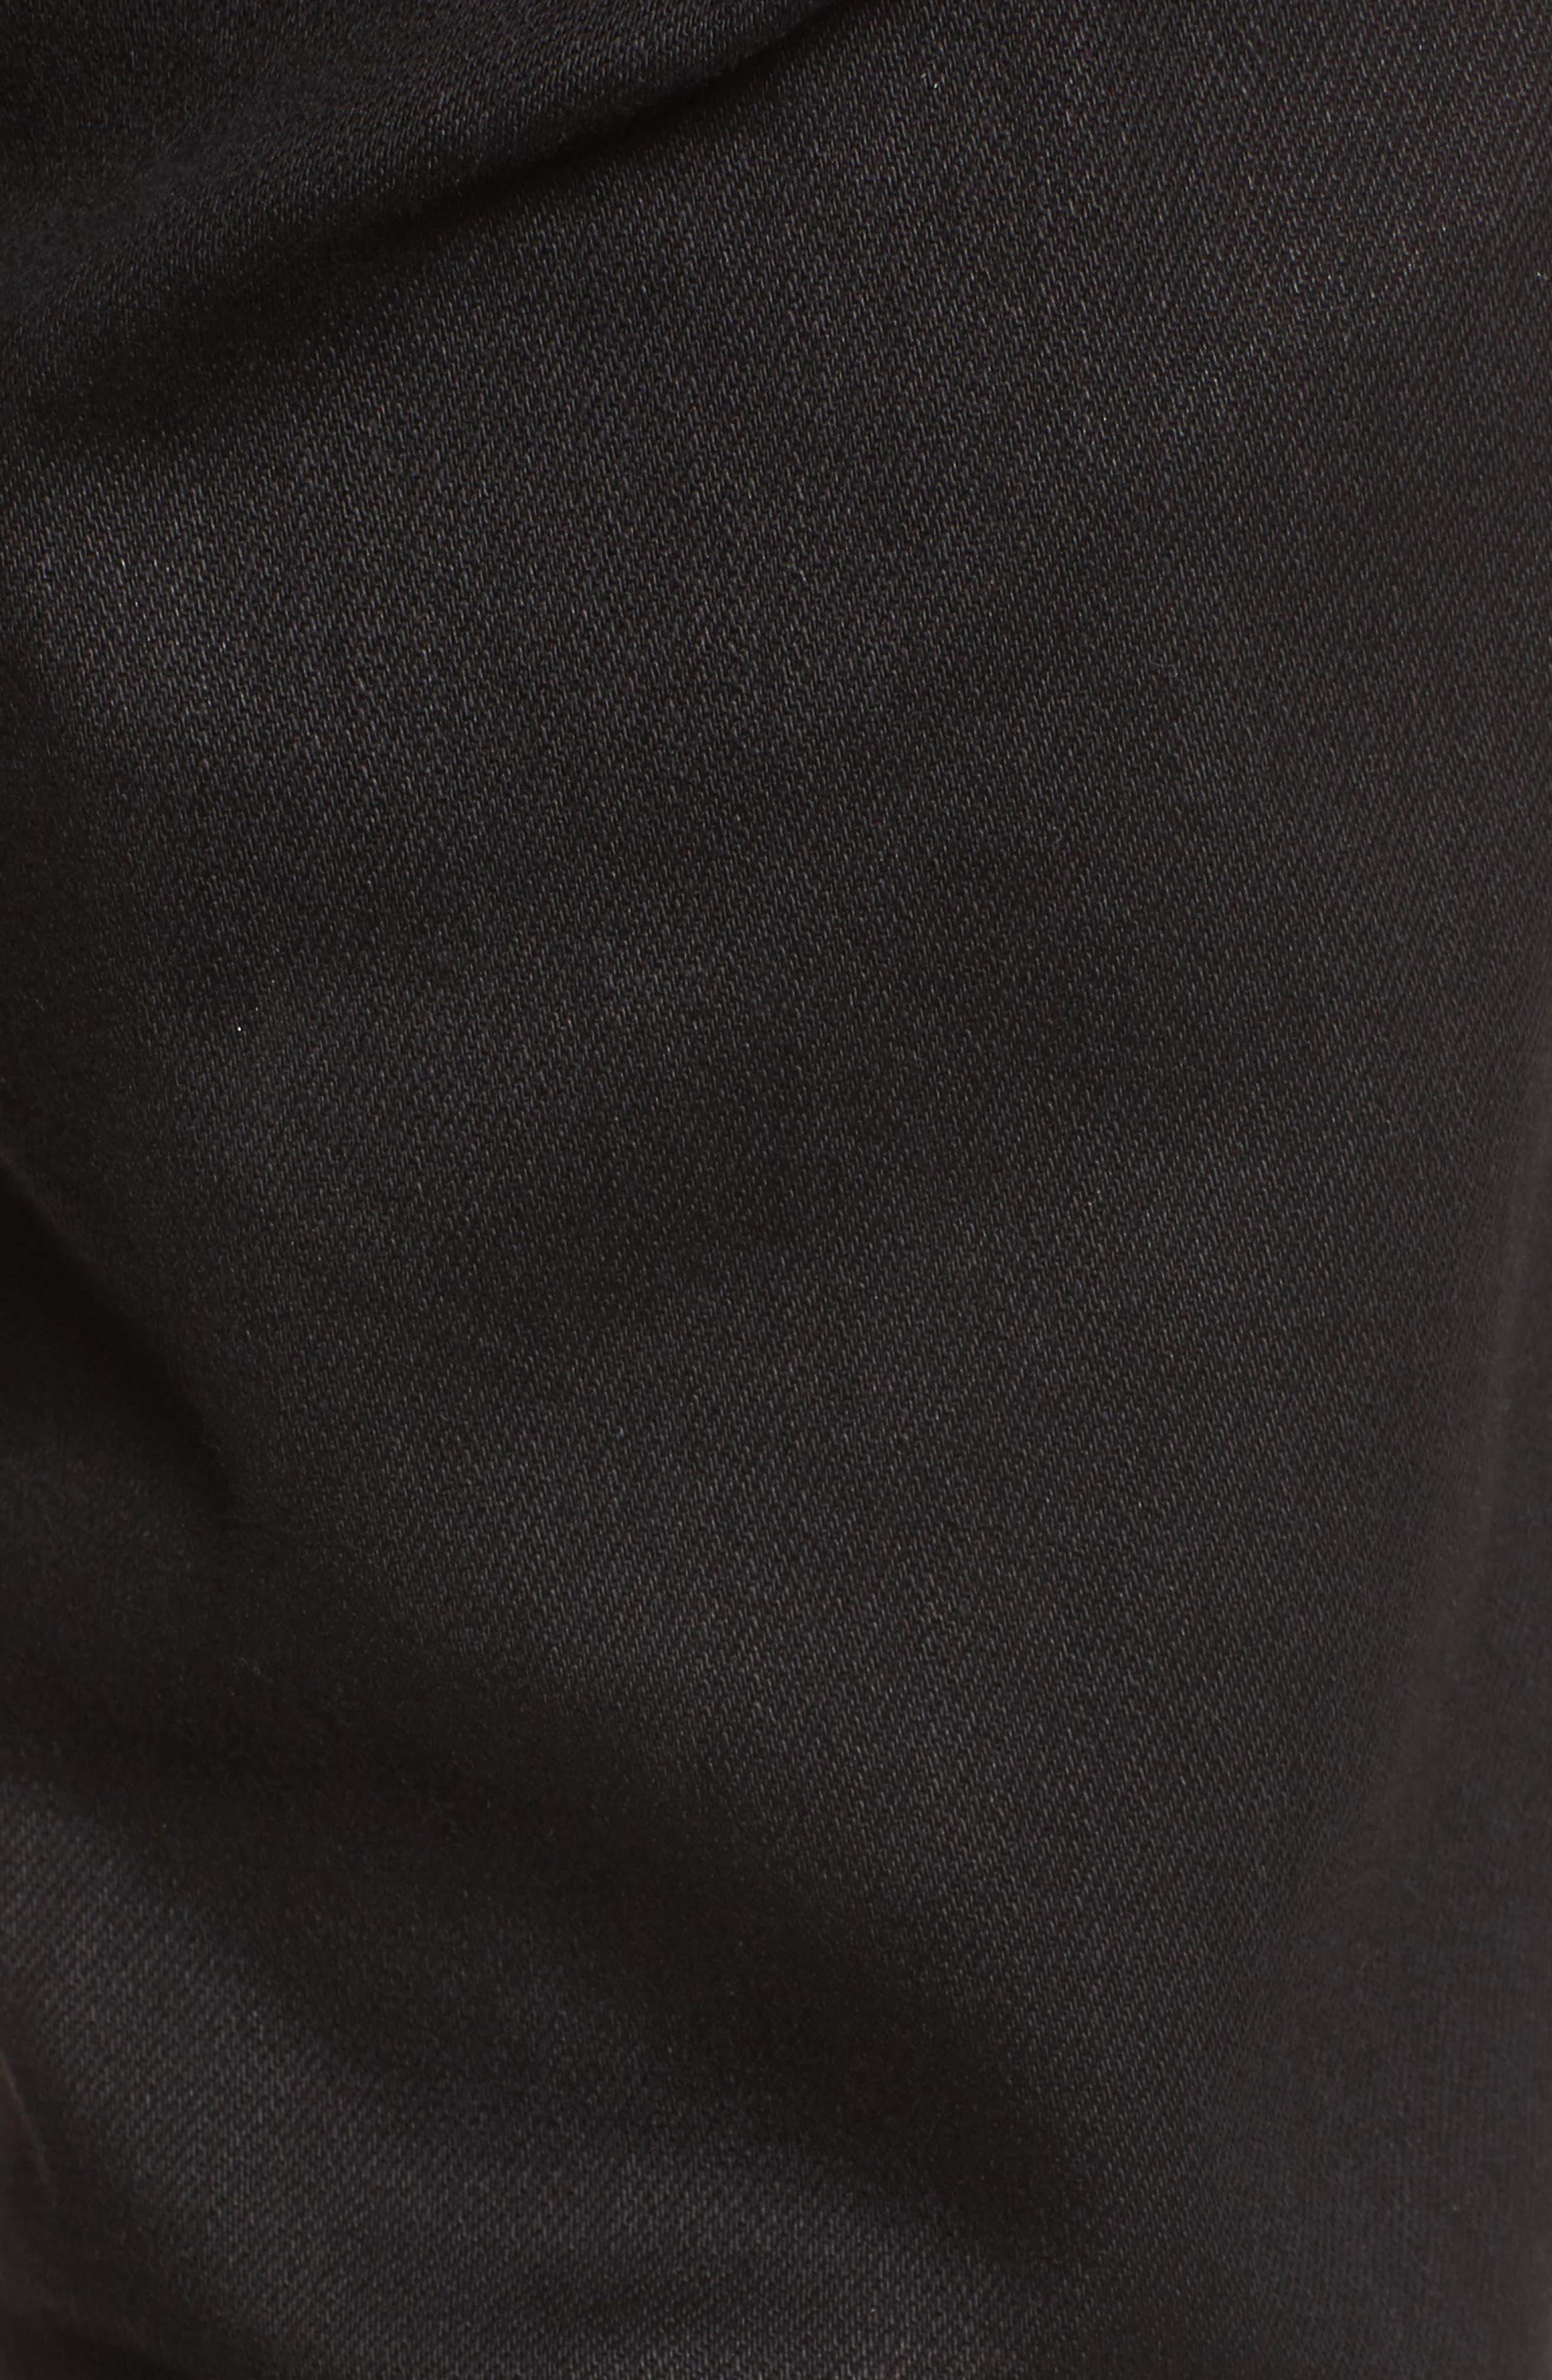 Destroyer Slim Fit Jeans,                             Alternate thumbnail 5, color,                             001